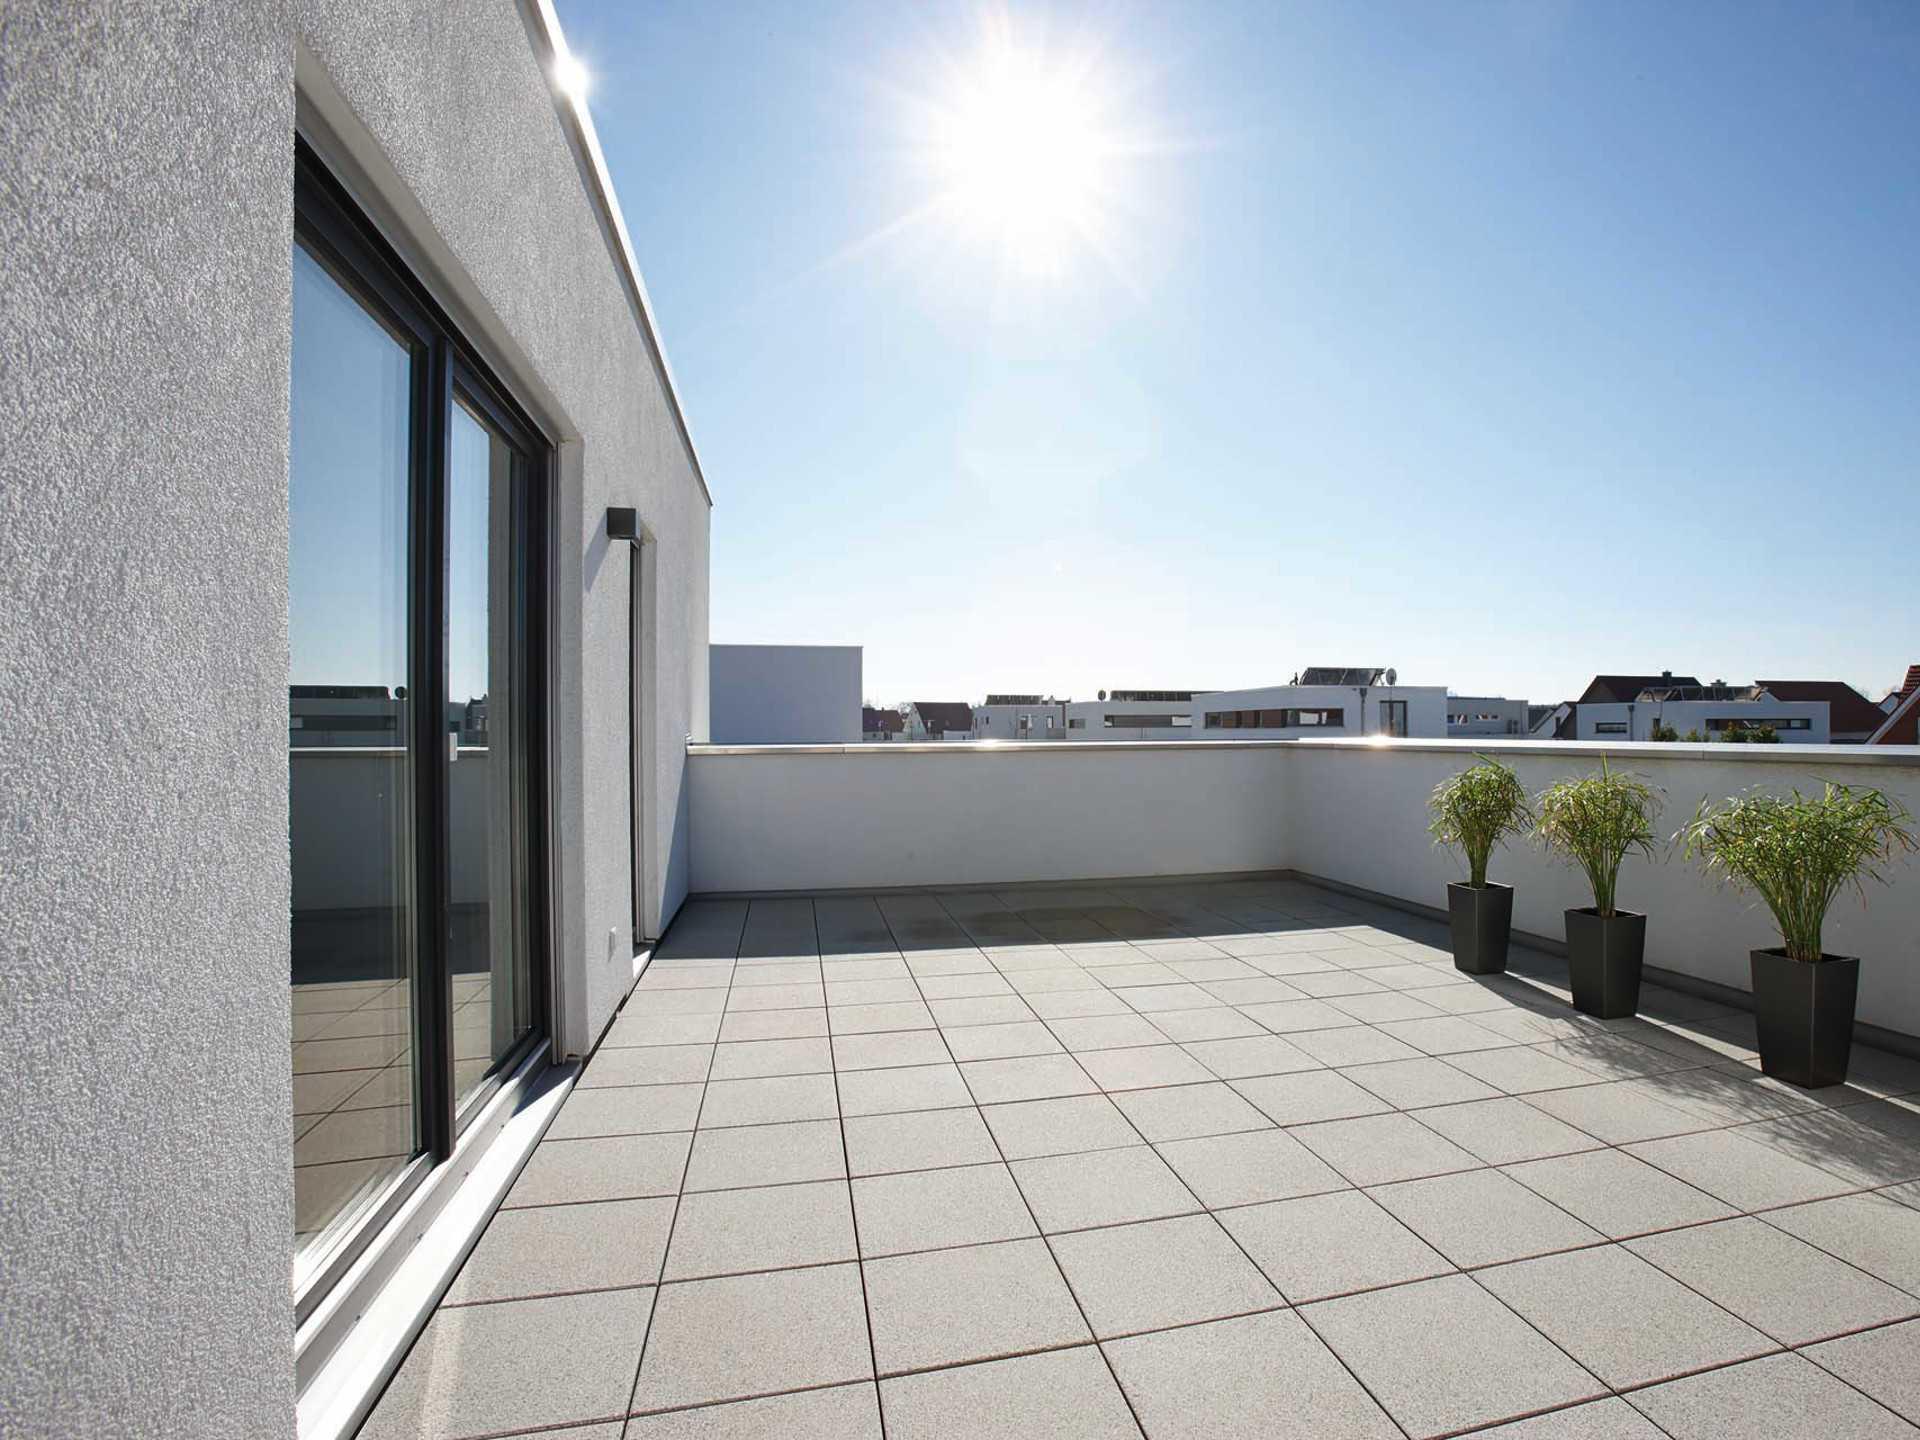 Architektur Trend Haus  FingerHaus  Musterhausnet